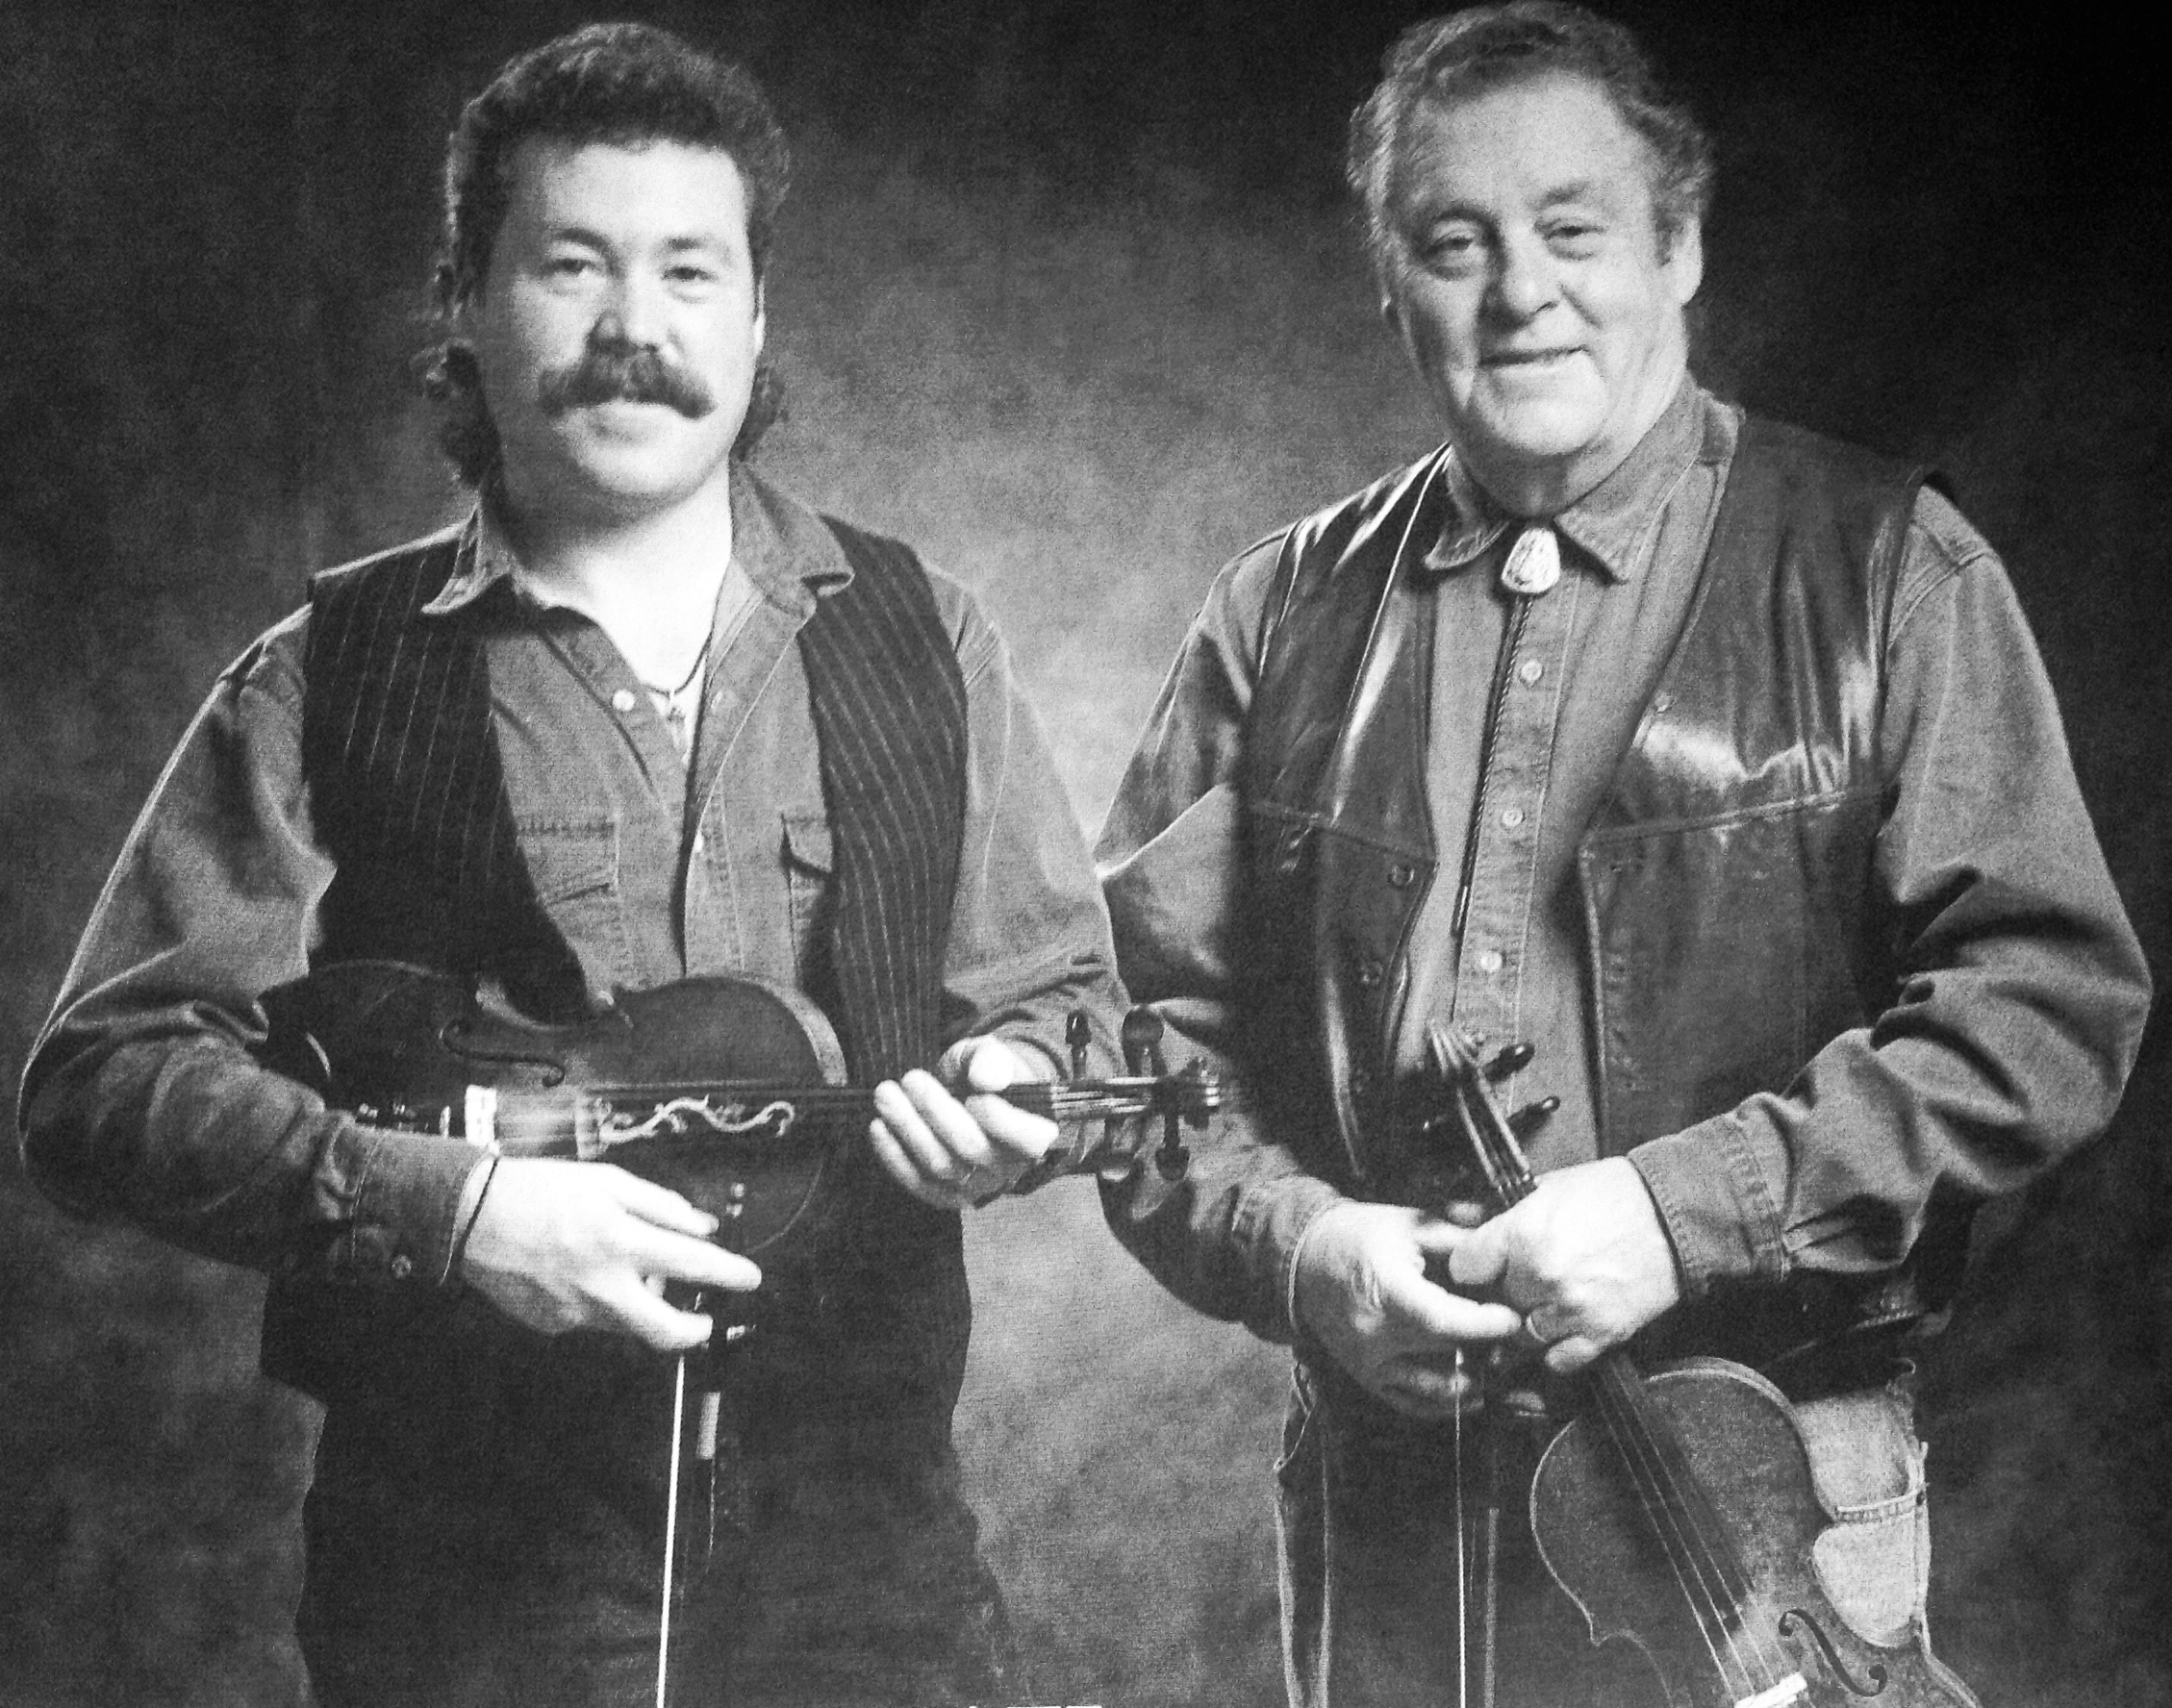 Tony & Gene Michael